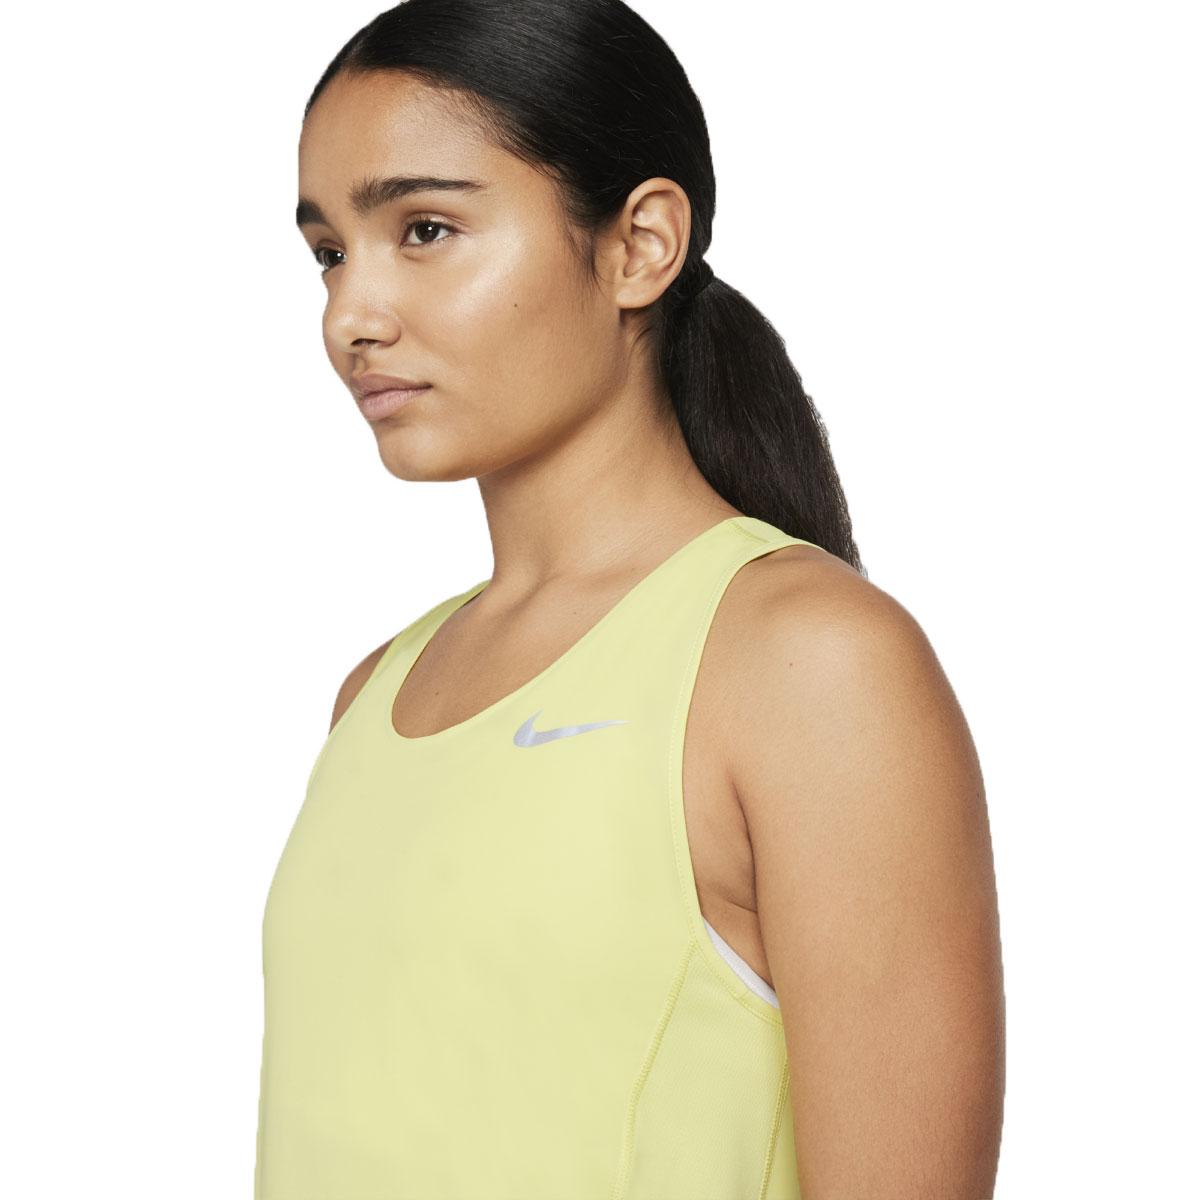 Women's Nike City Sleek Tank - Color: Limelight/Reflective - Size: S, Limelight/Reflective, large, image 3